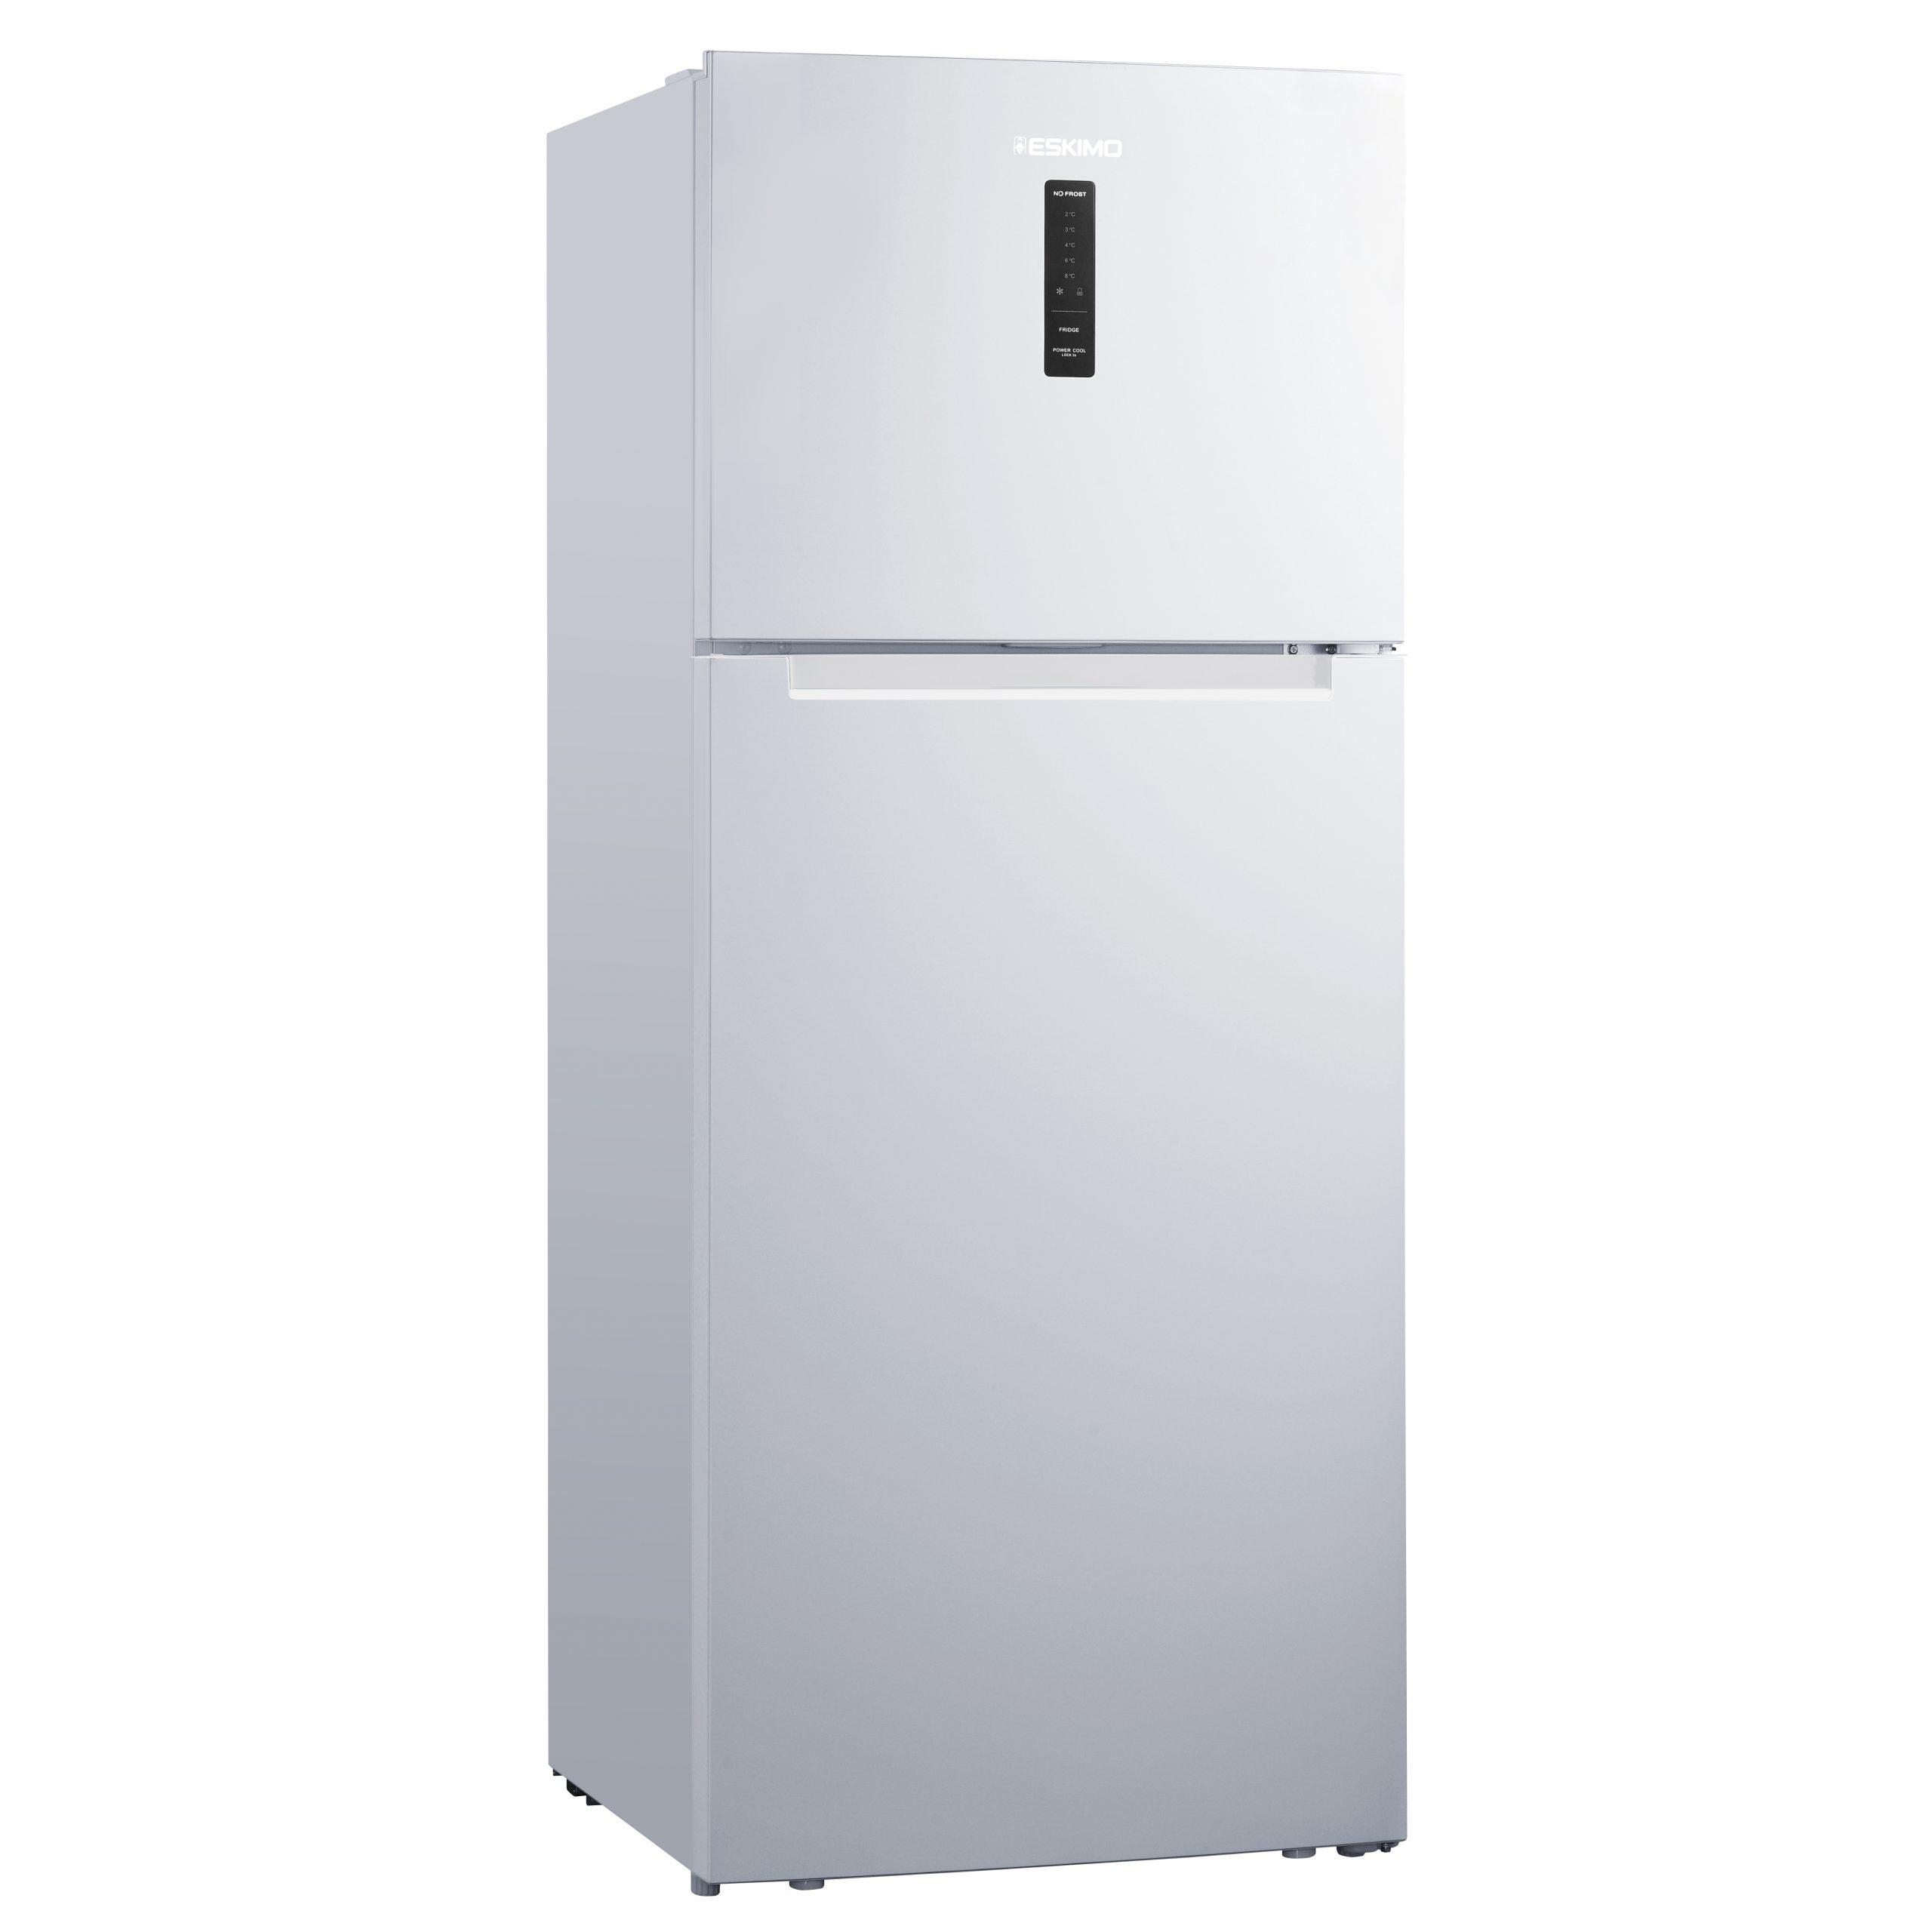 Eskimo Δίπορτο Ψυγείο ES 8436 NF W